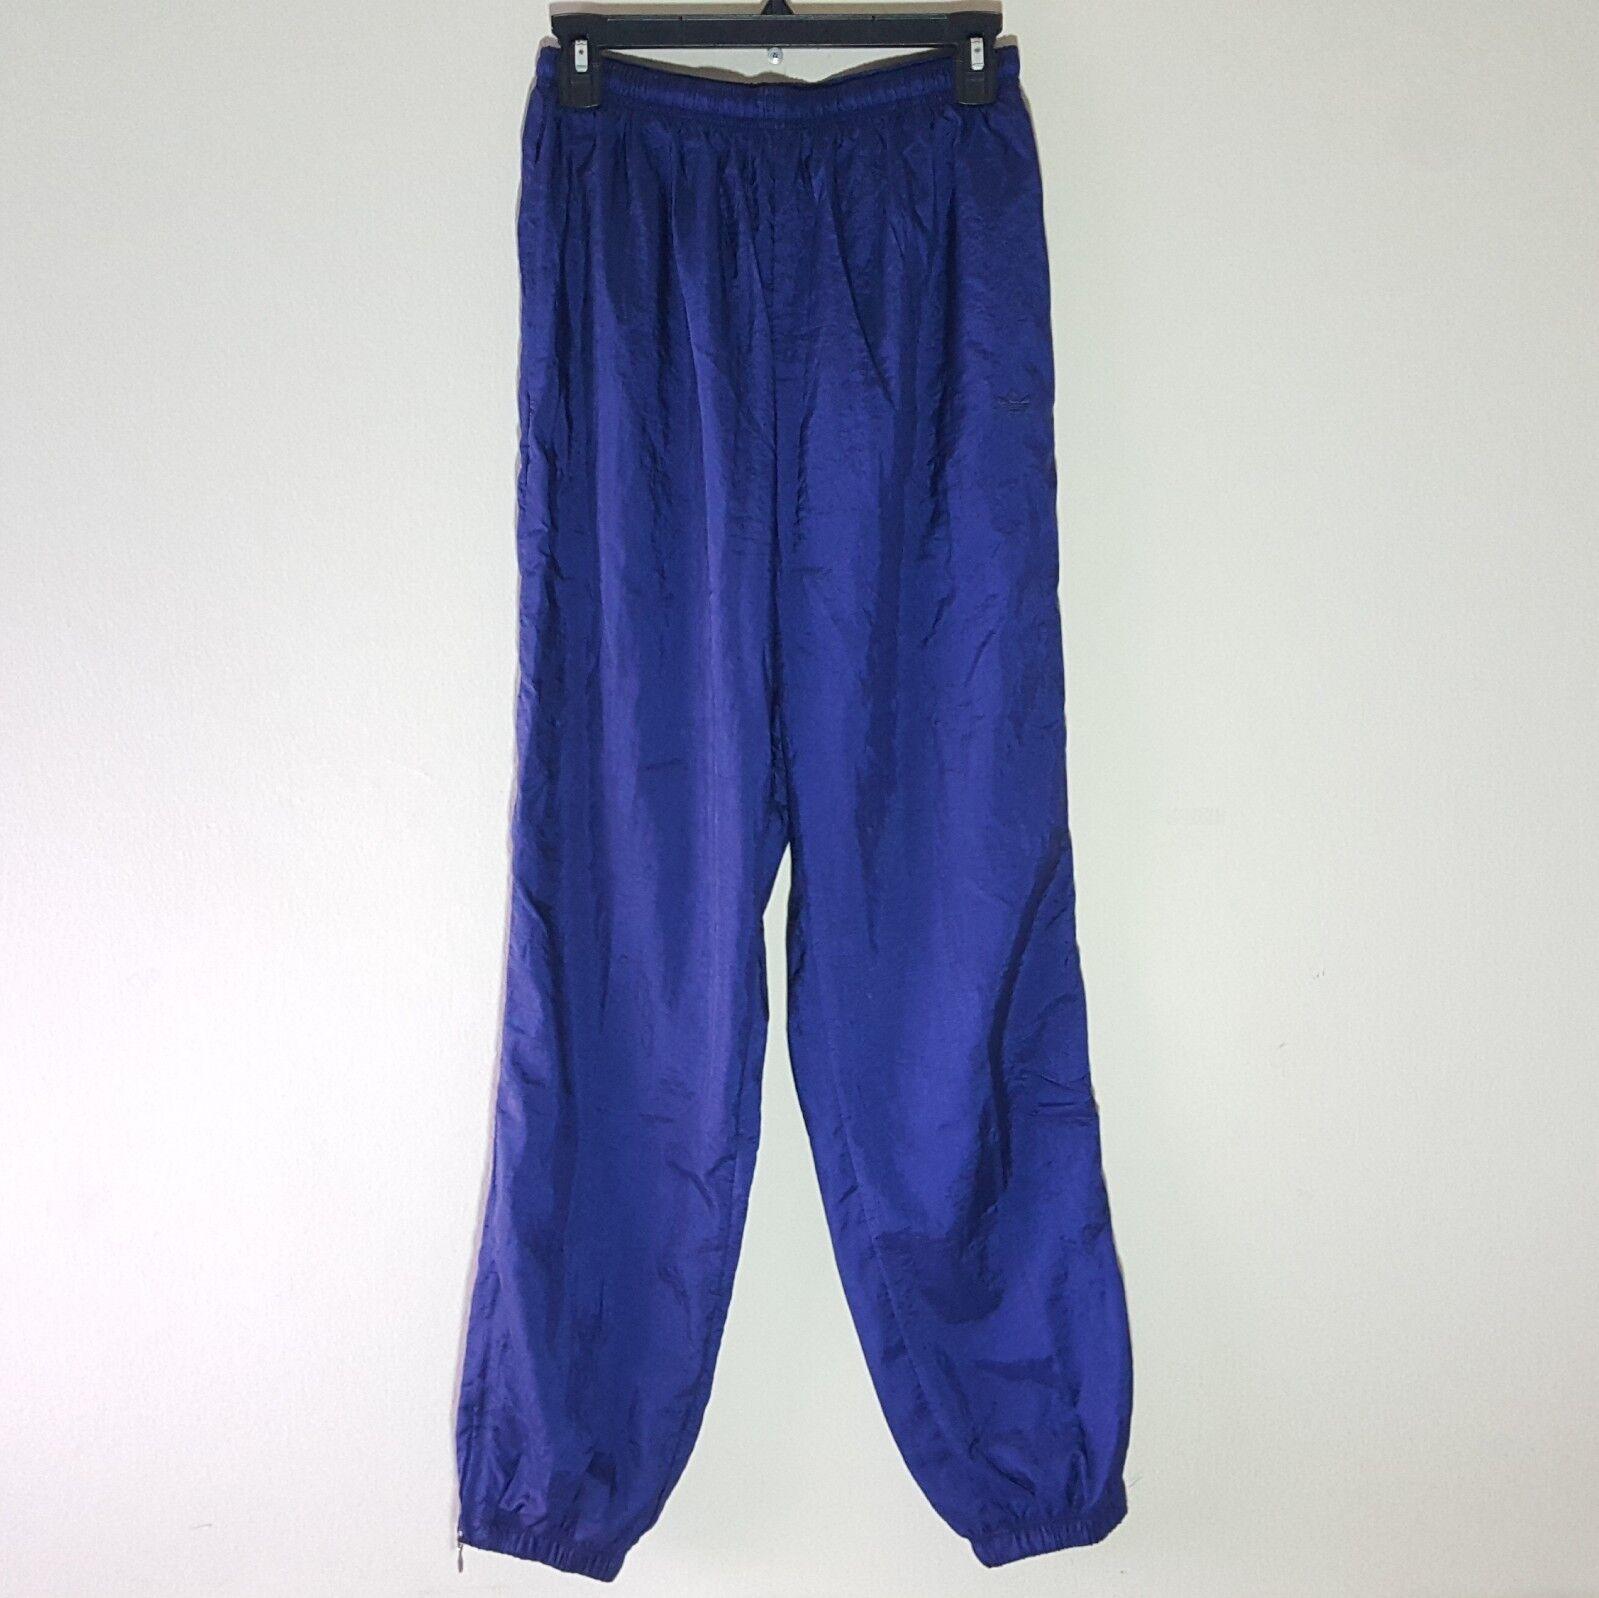 Vintage bluee Adidas Original Trefoil Nylon Sweat Pants Size Small -D3